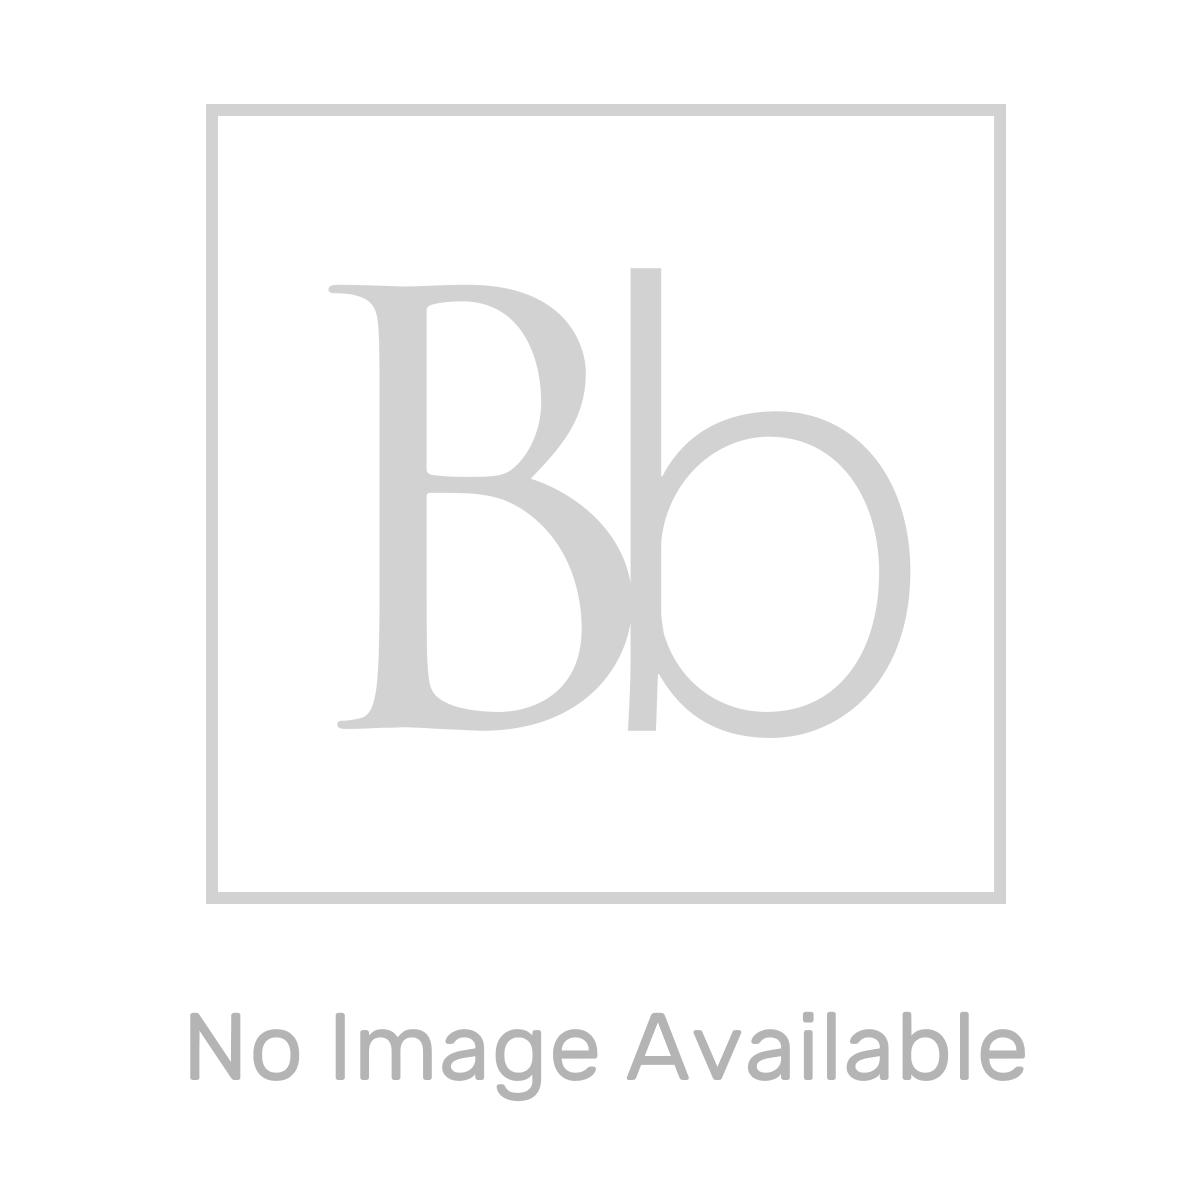 Aquadart Rectangular 1000 x 900 Shower Tray Line Drawing